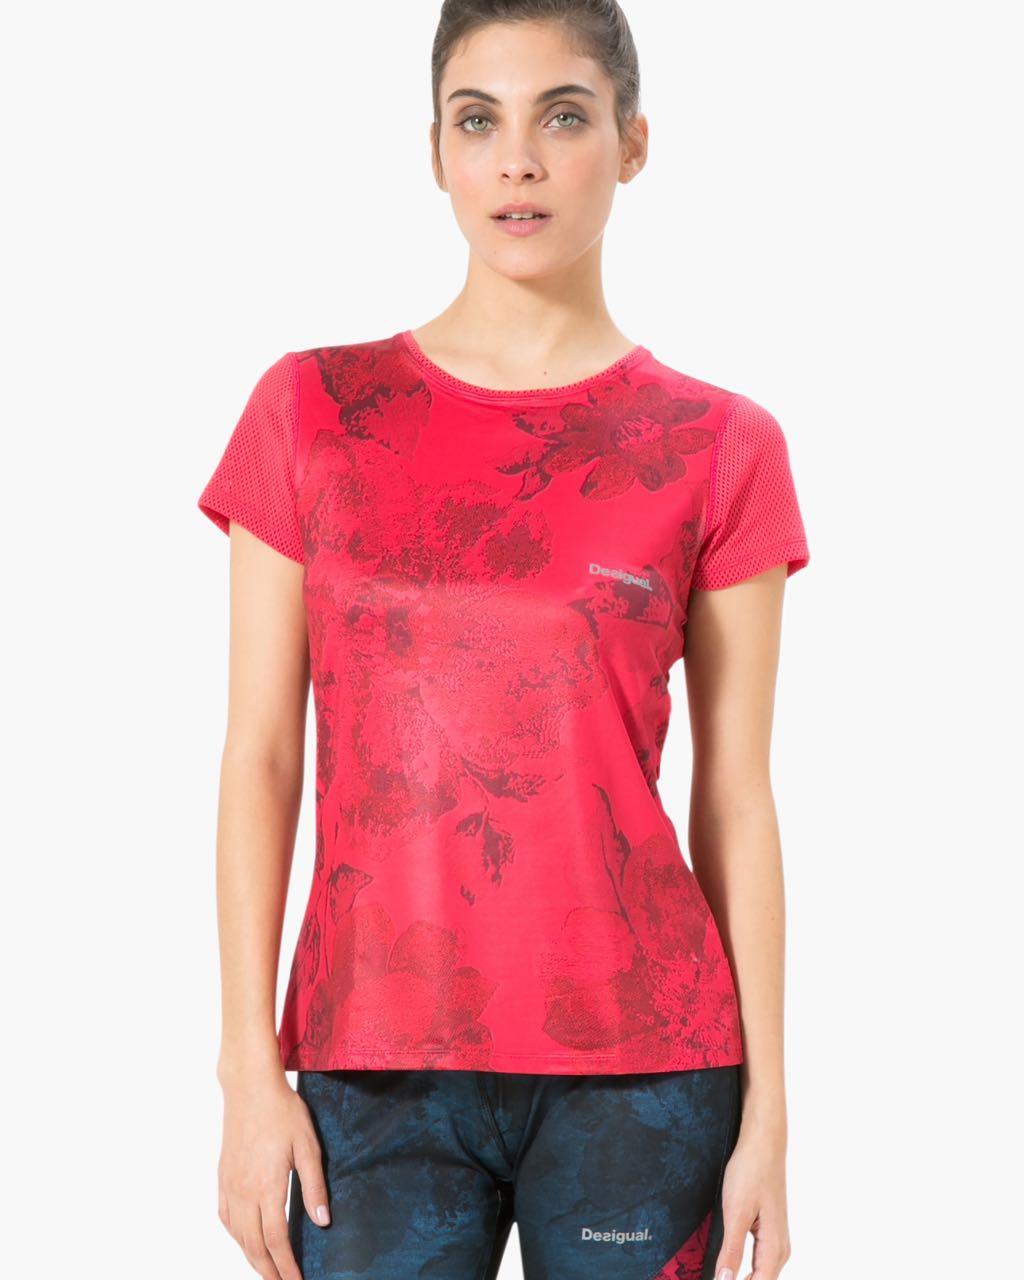 17WTRK23_3139 Desigual Sport T-Shirt Setin Tshirt Buy Online